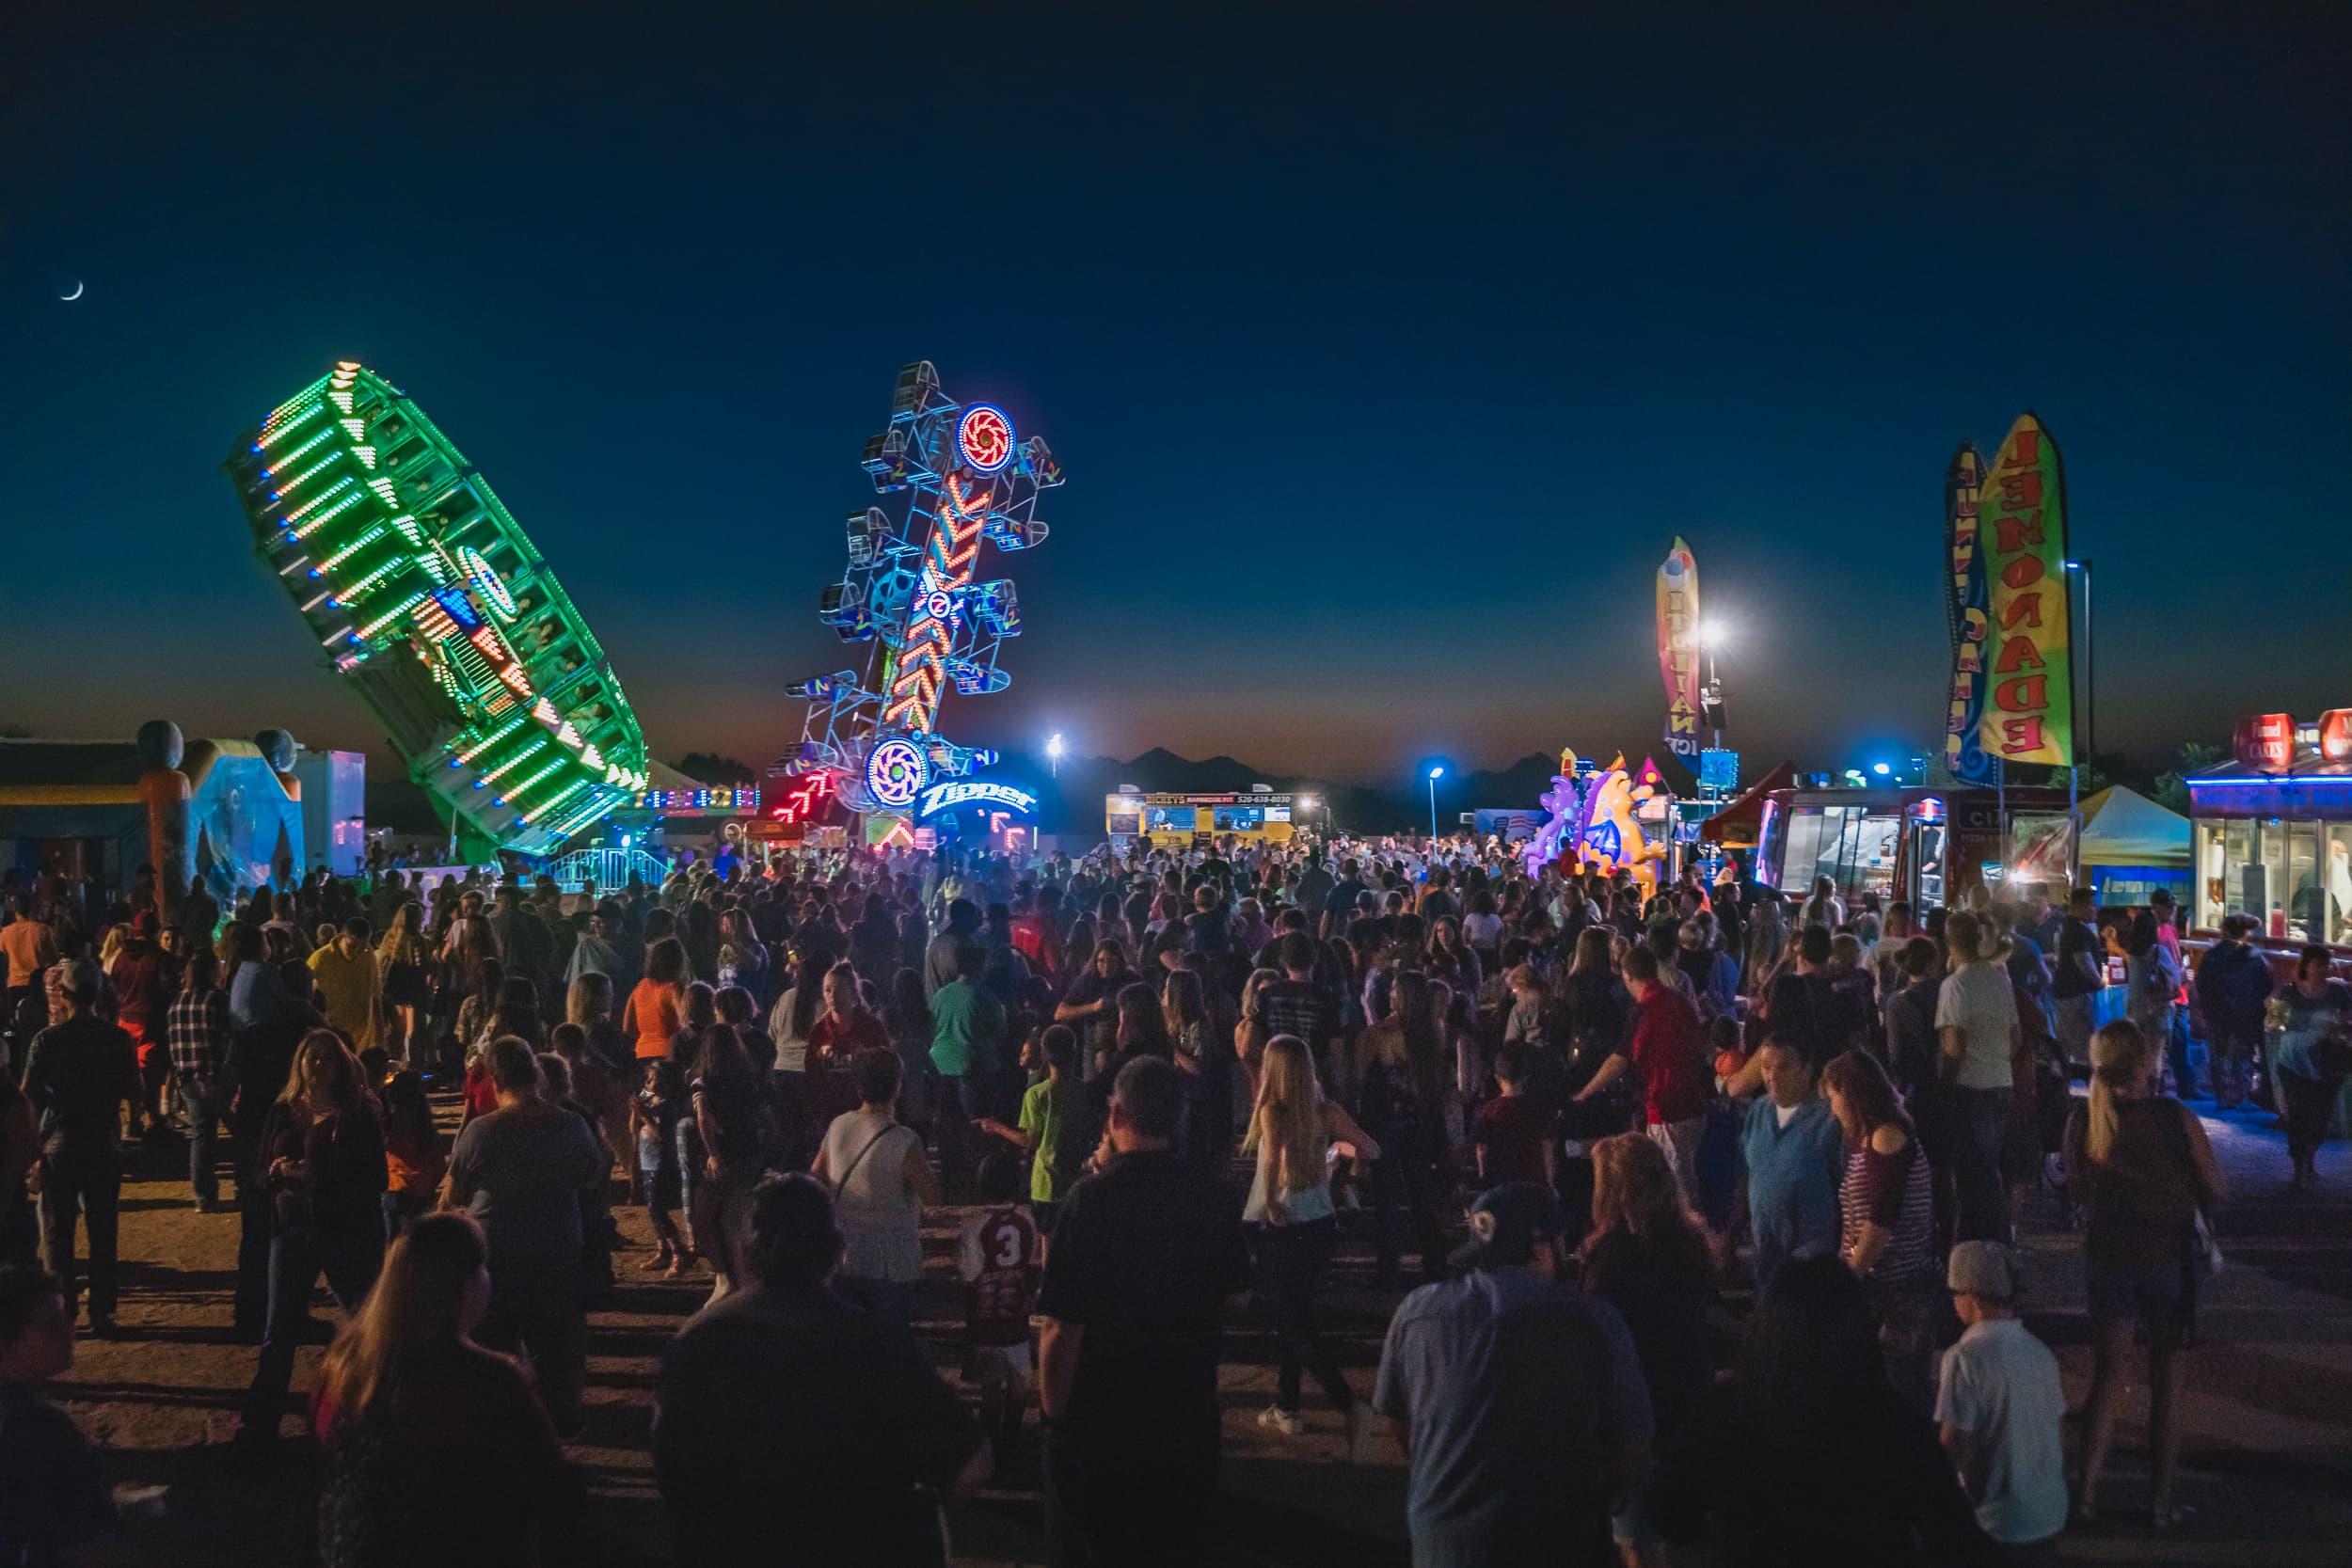 Fall Festival 2020.Marana Cotton Festival 2020 Festival 2020